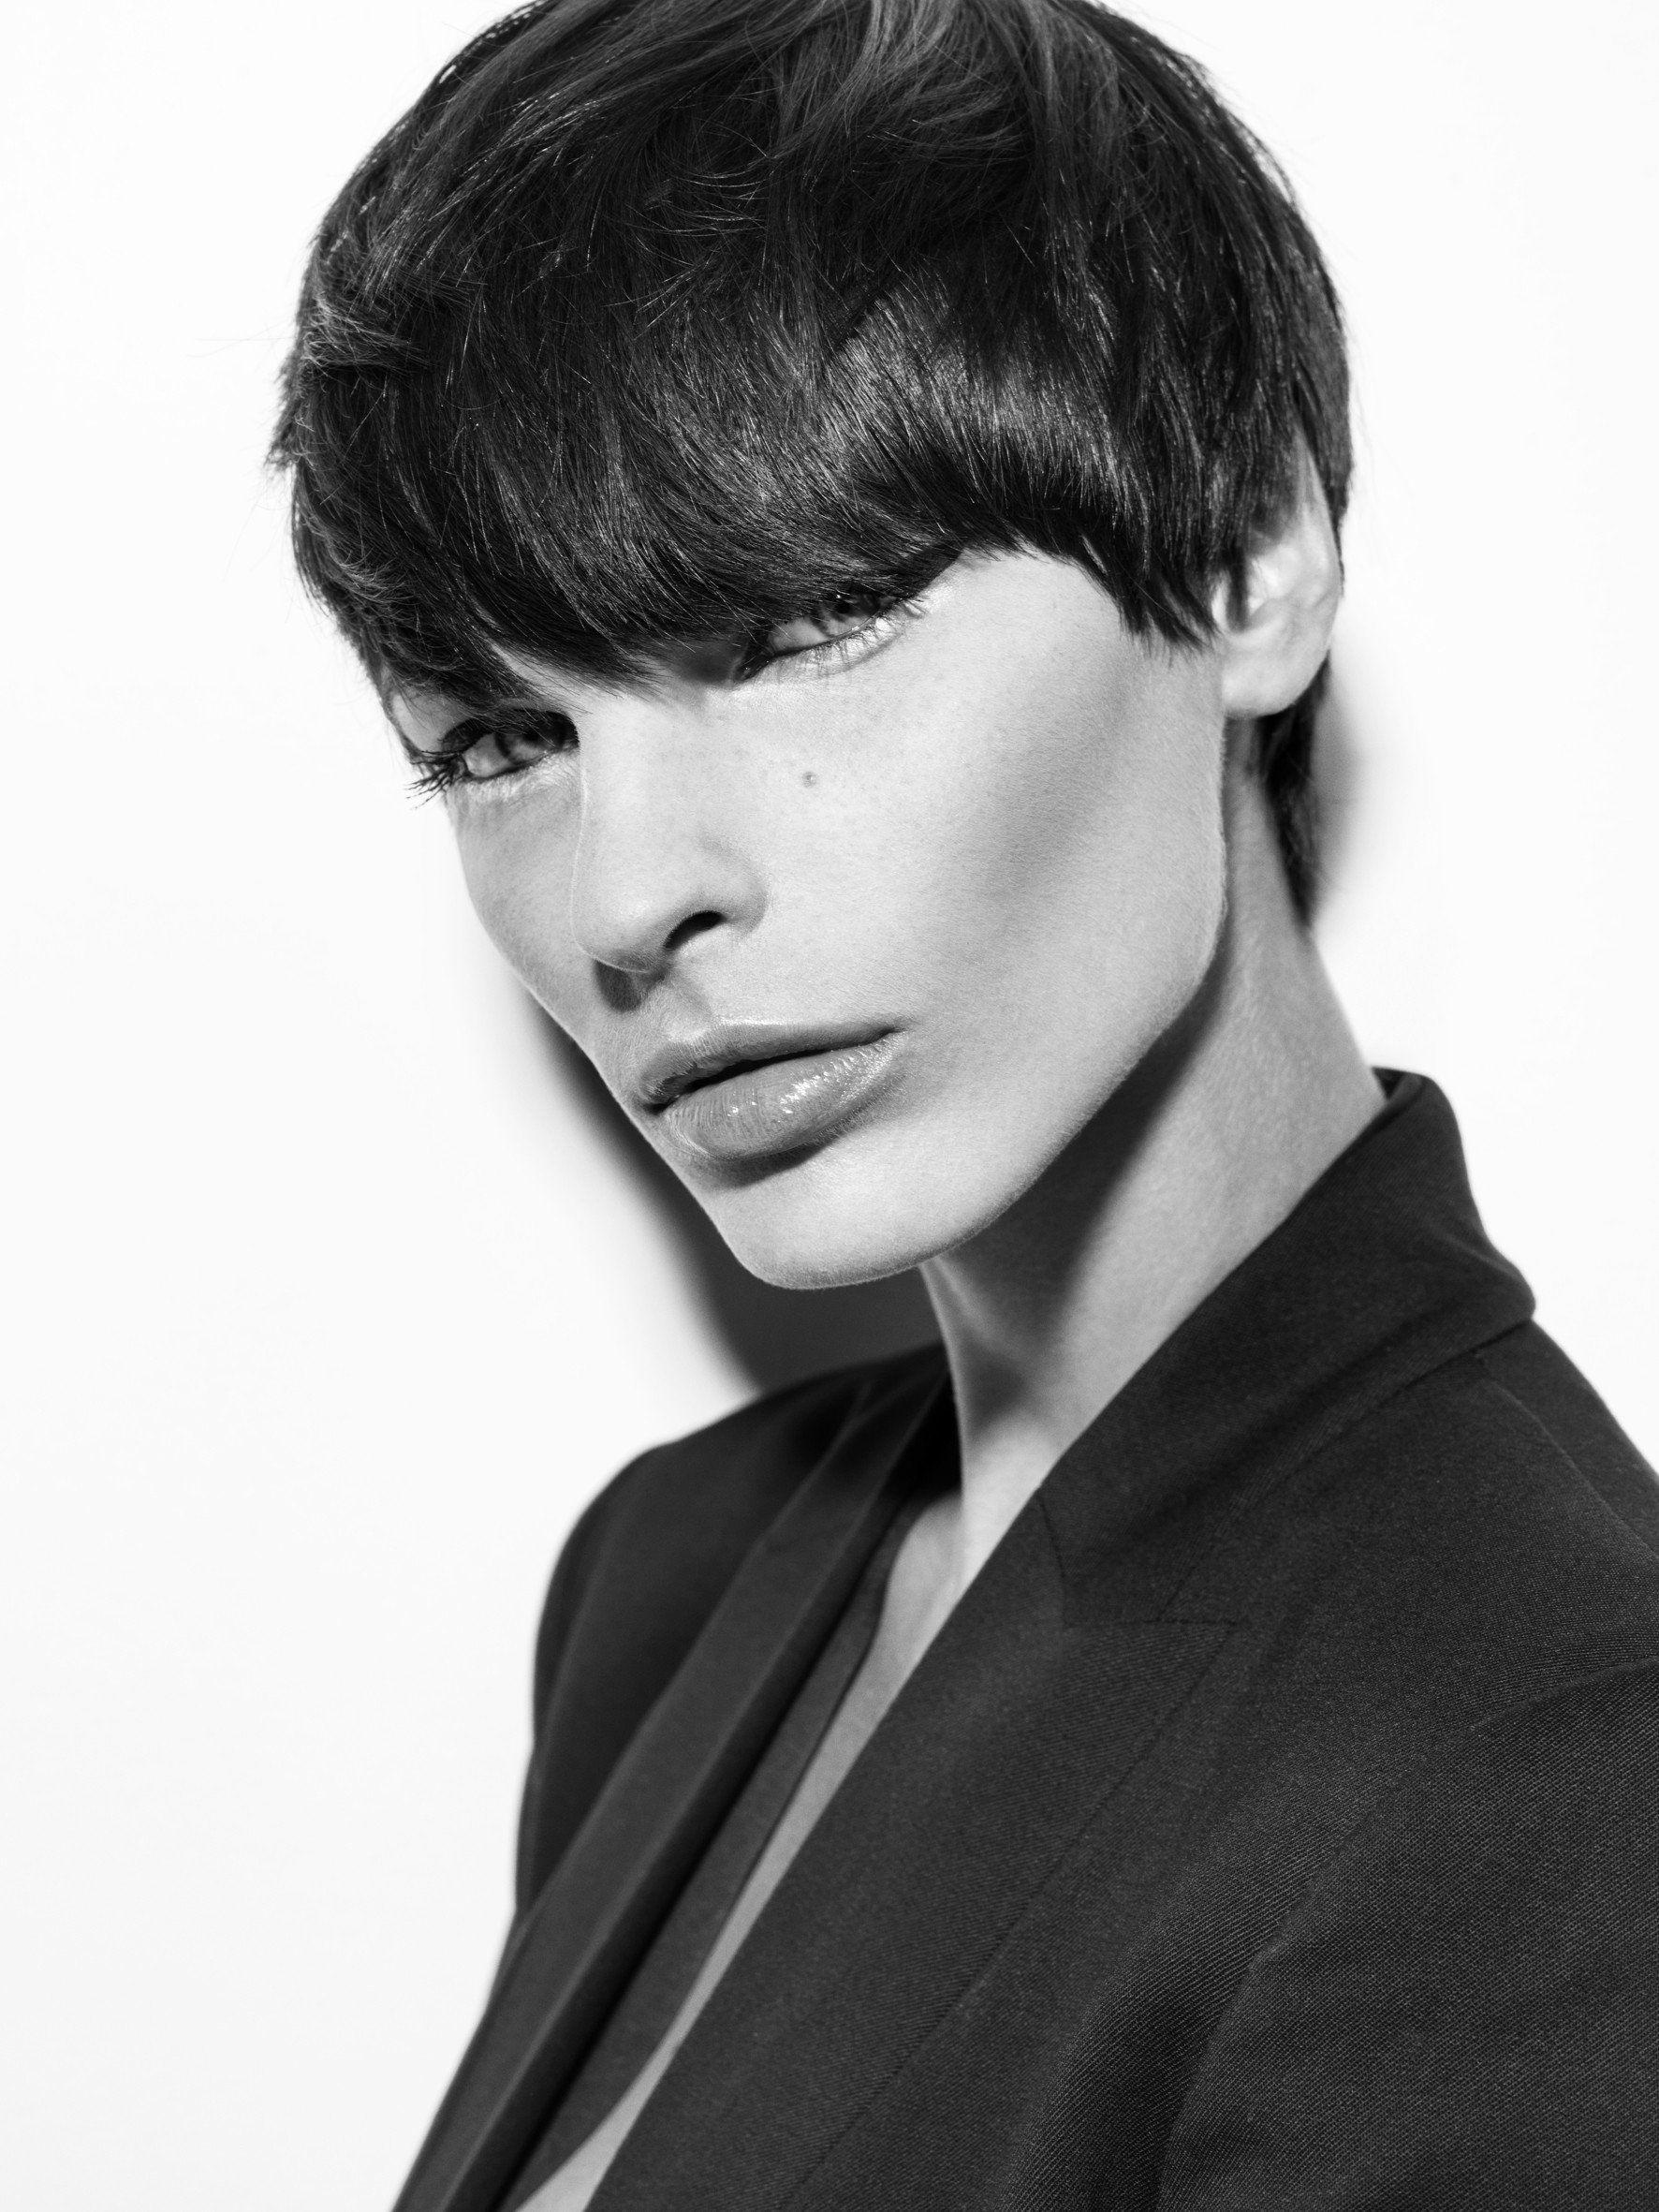 hairstyles shorthair tigi bob pixie styling chiara samantha